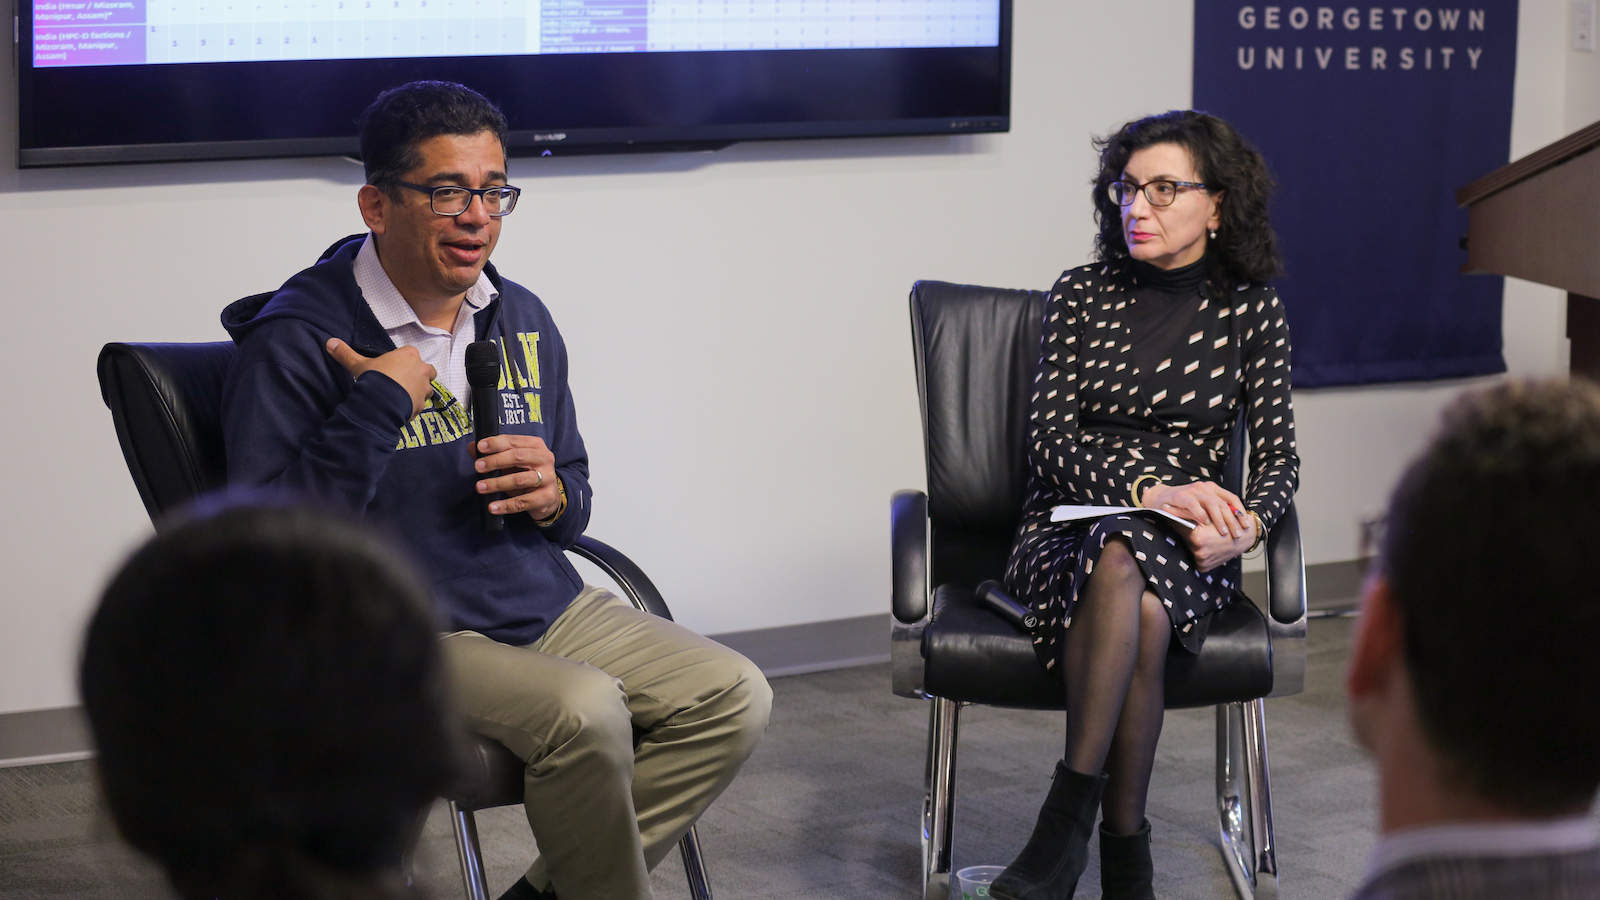 Irfan Nooruddin and Jocelyne Cesari speak at event on religion and nationalism in India.